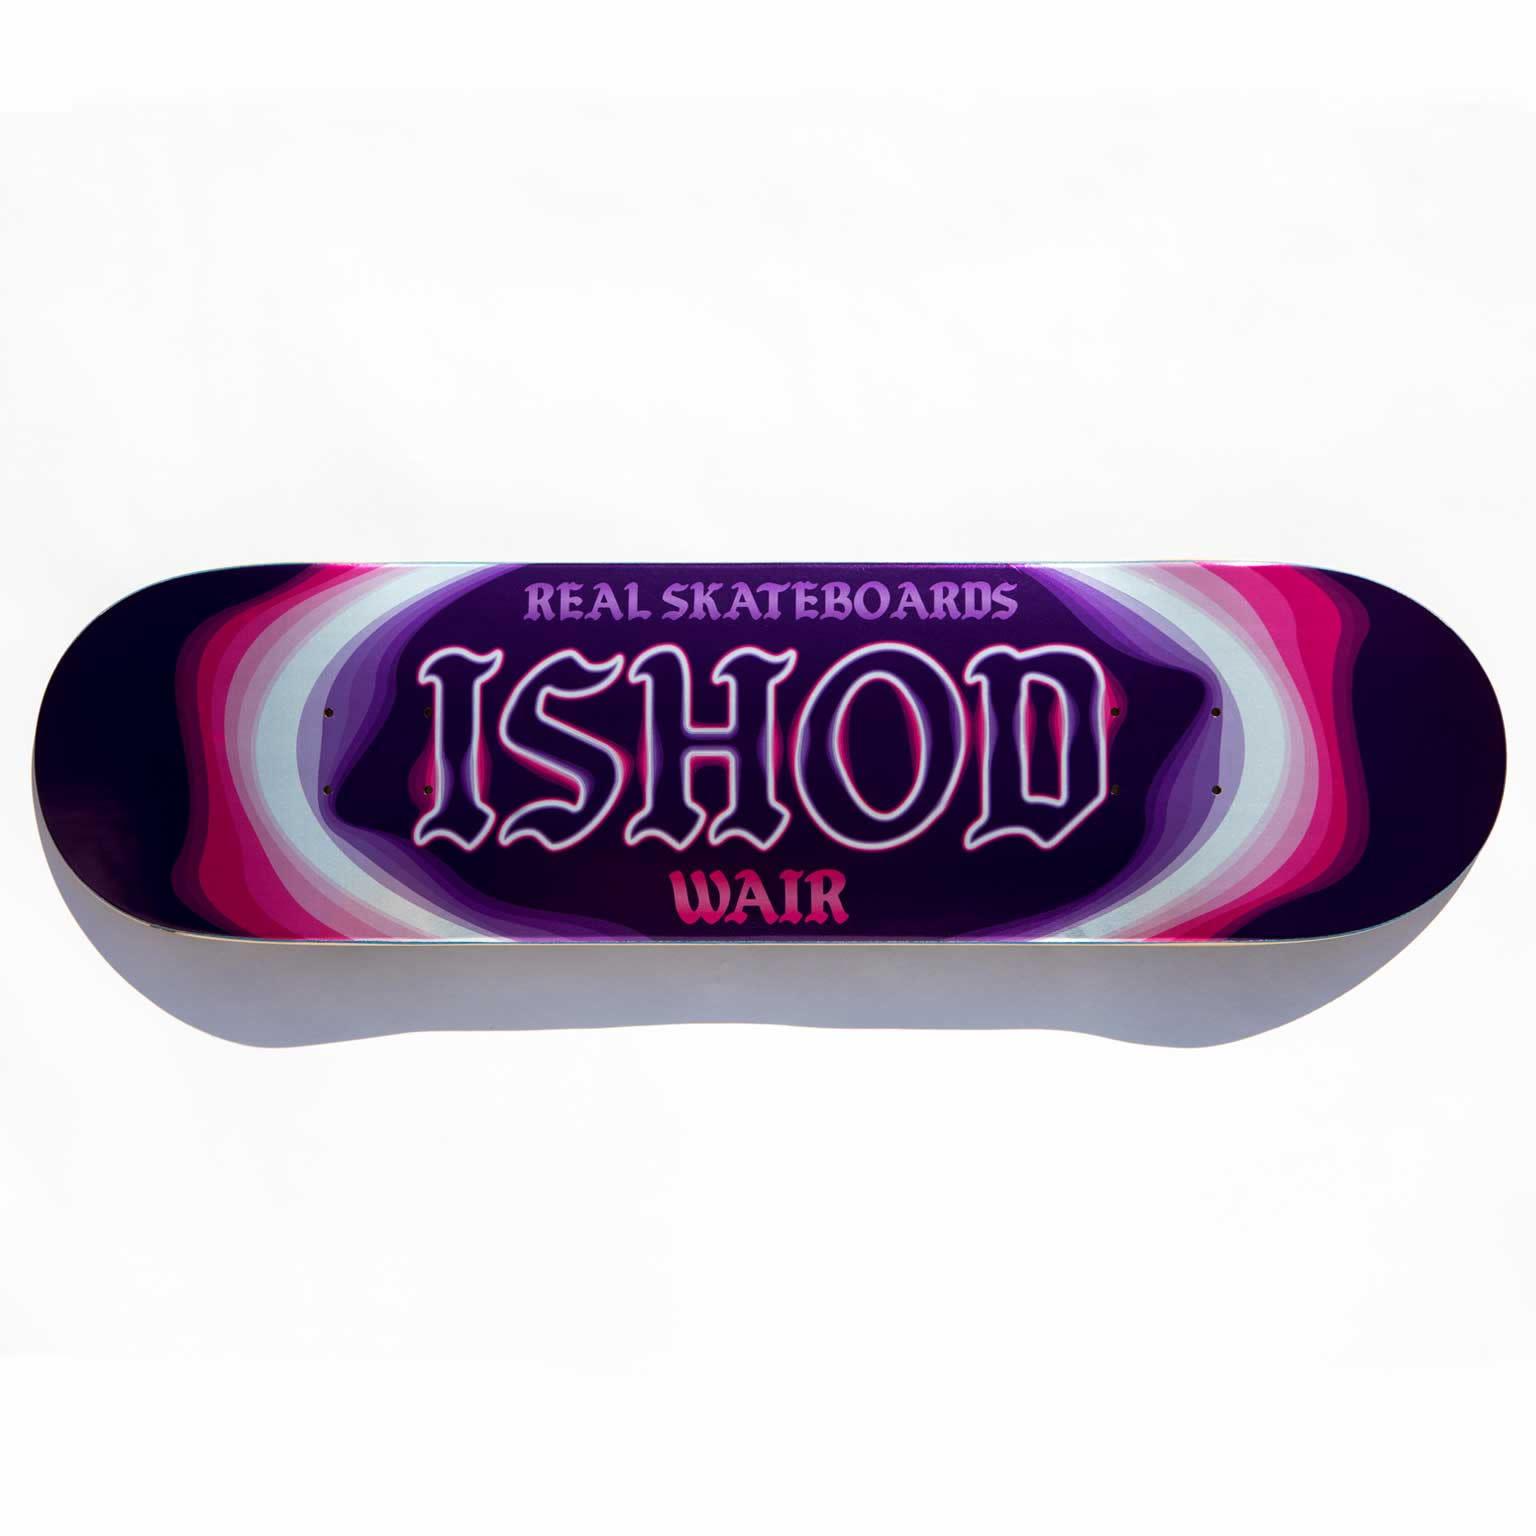 Real Skateboards Bandwidth Oval Ishod 8.18